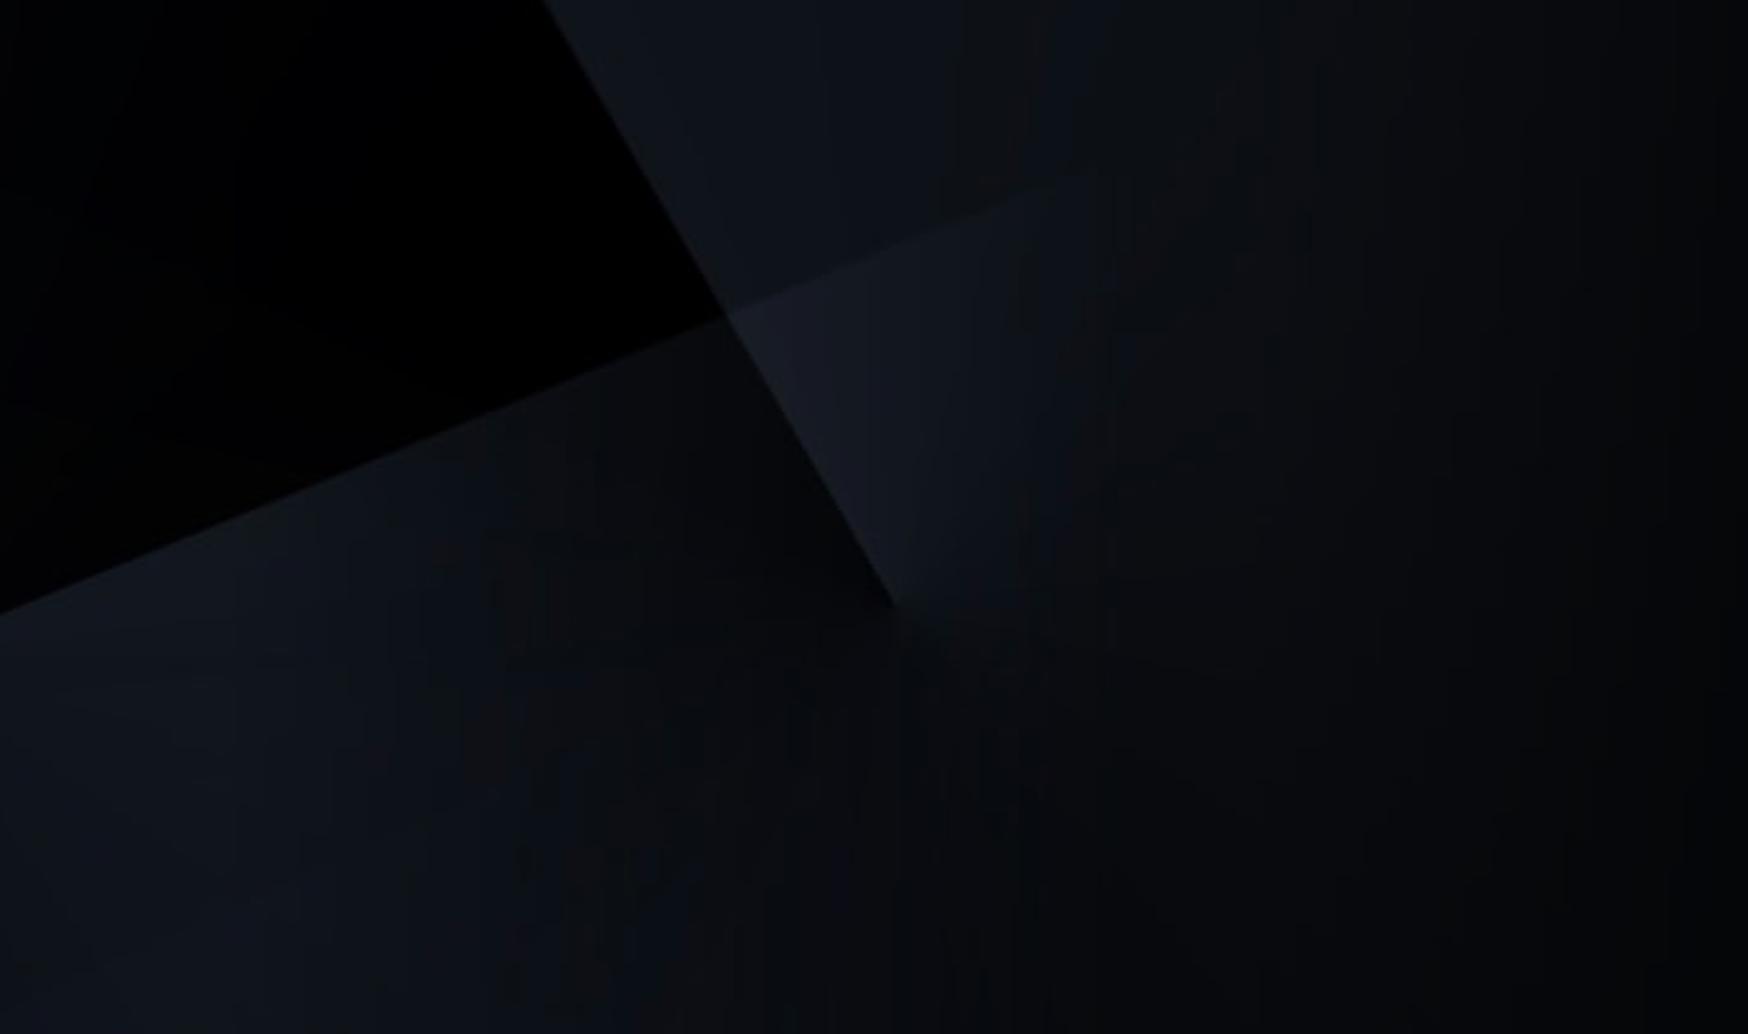 Sentinel Background Graphic